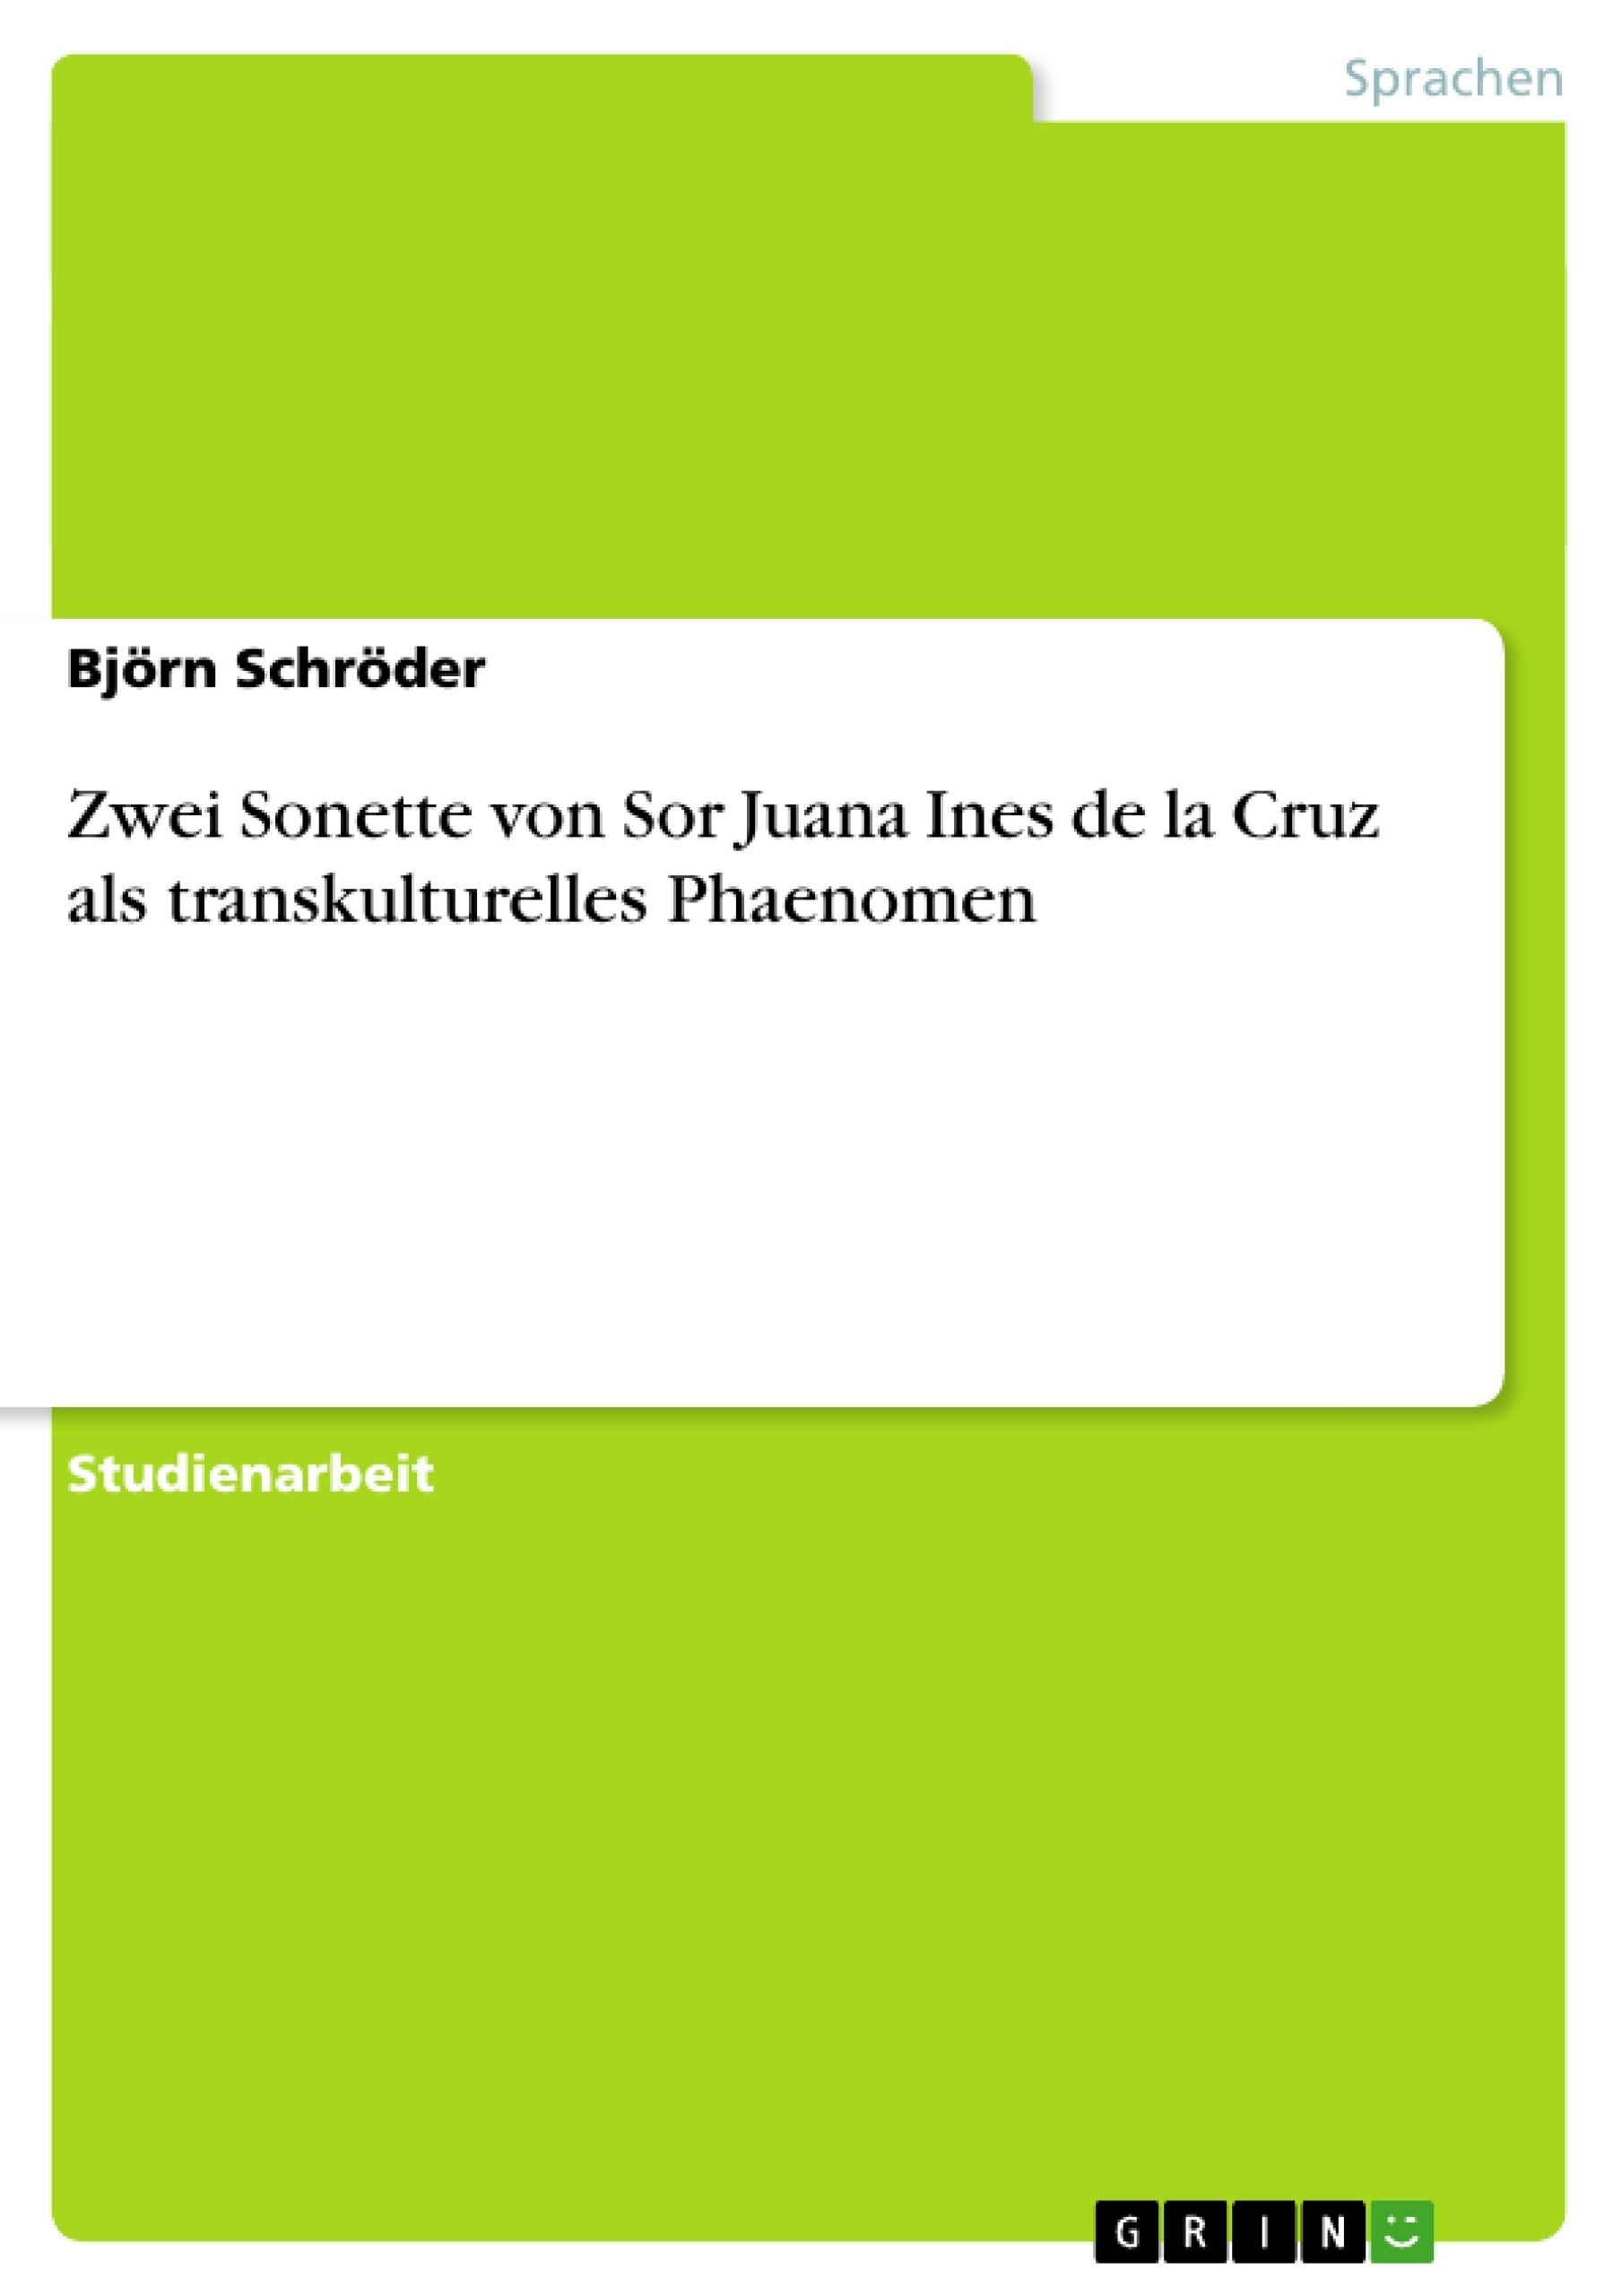 Titel: Zwei Sonette von Sor Juana Ines de la Cruz als transkulturelles Phaenomen